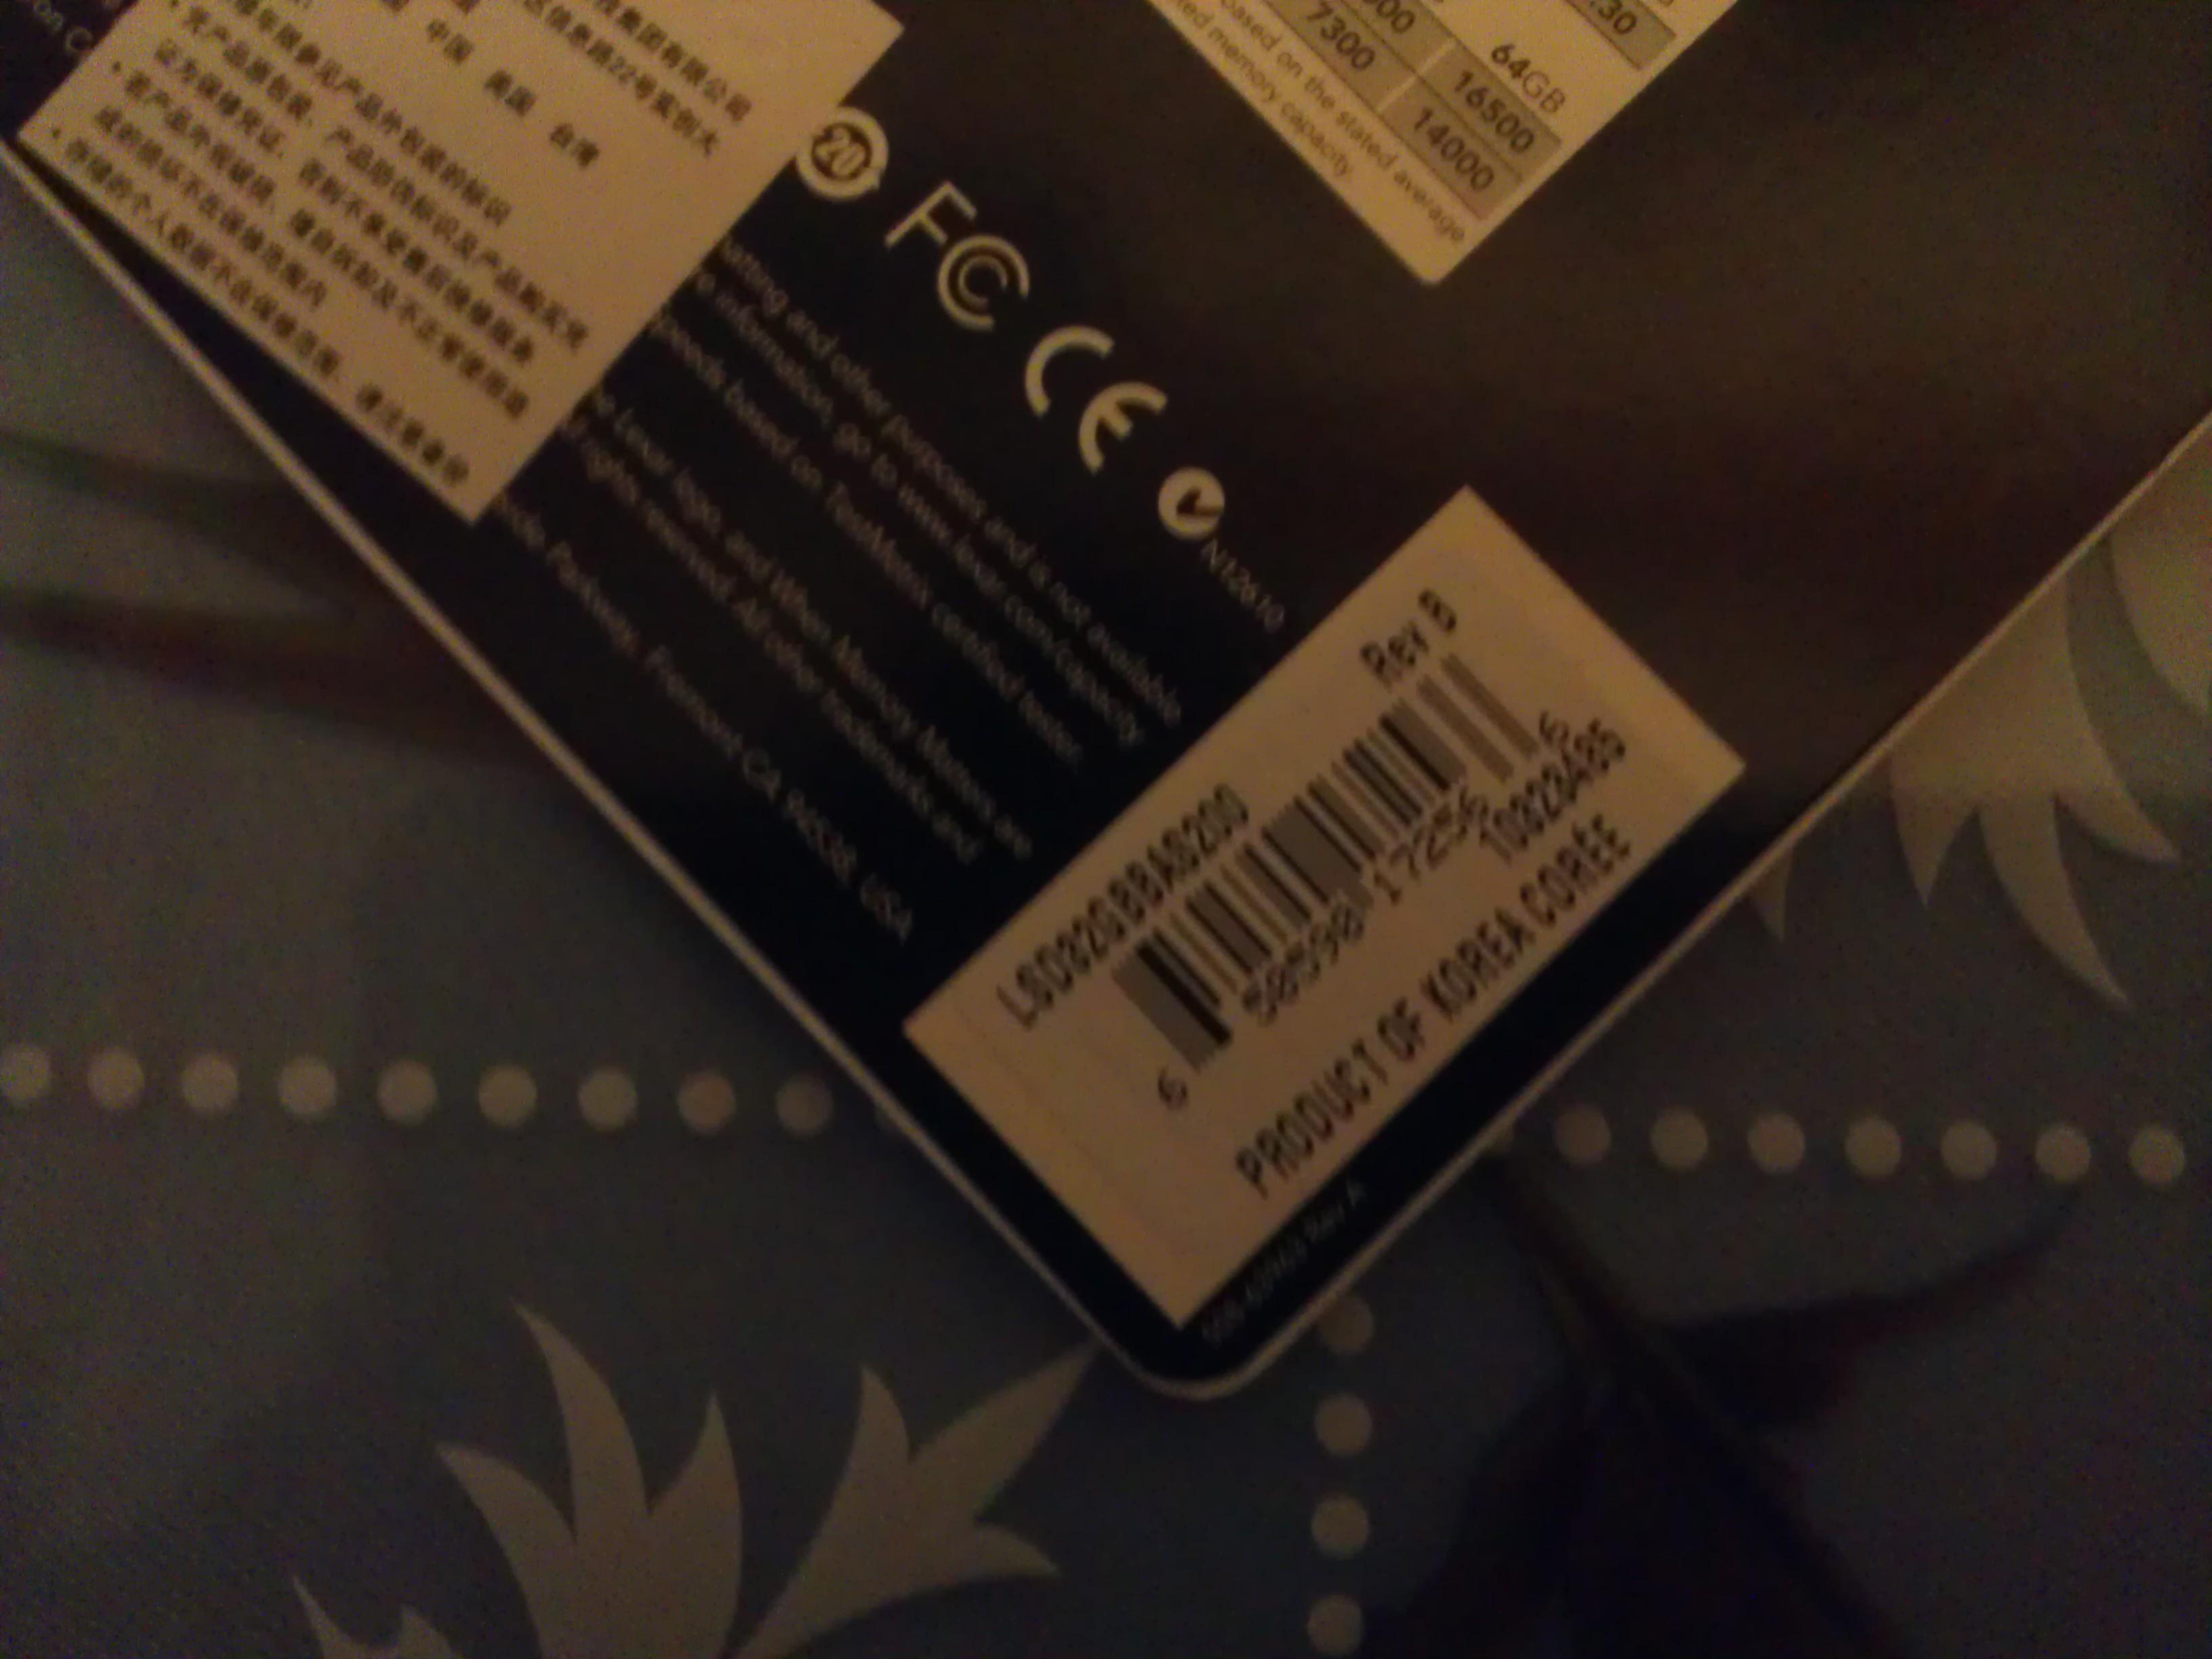 cheap nike free 5.0 v4 00267298 onsale